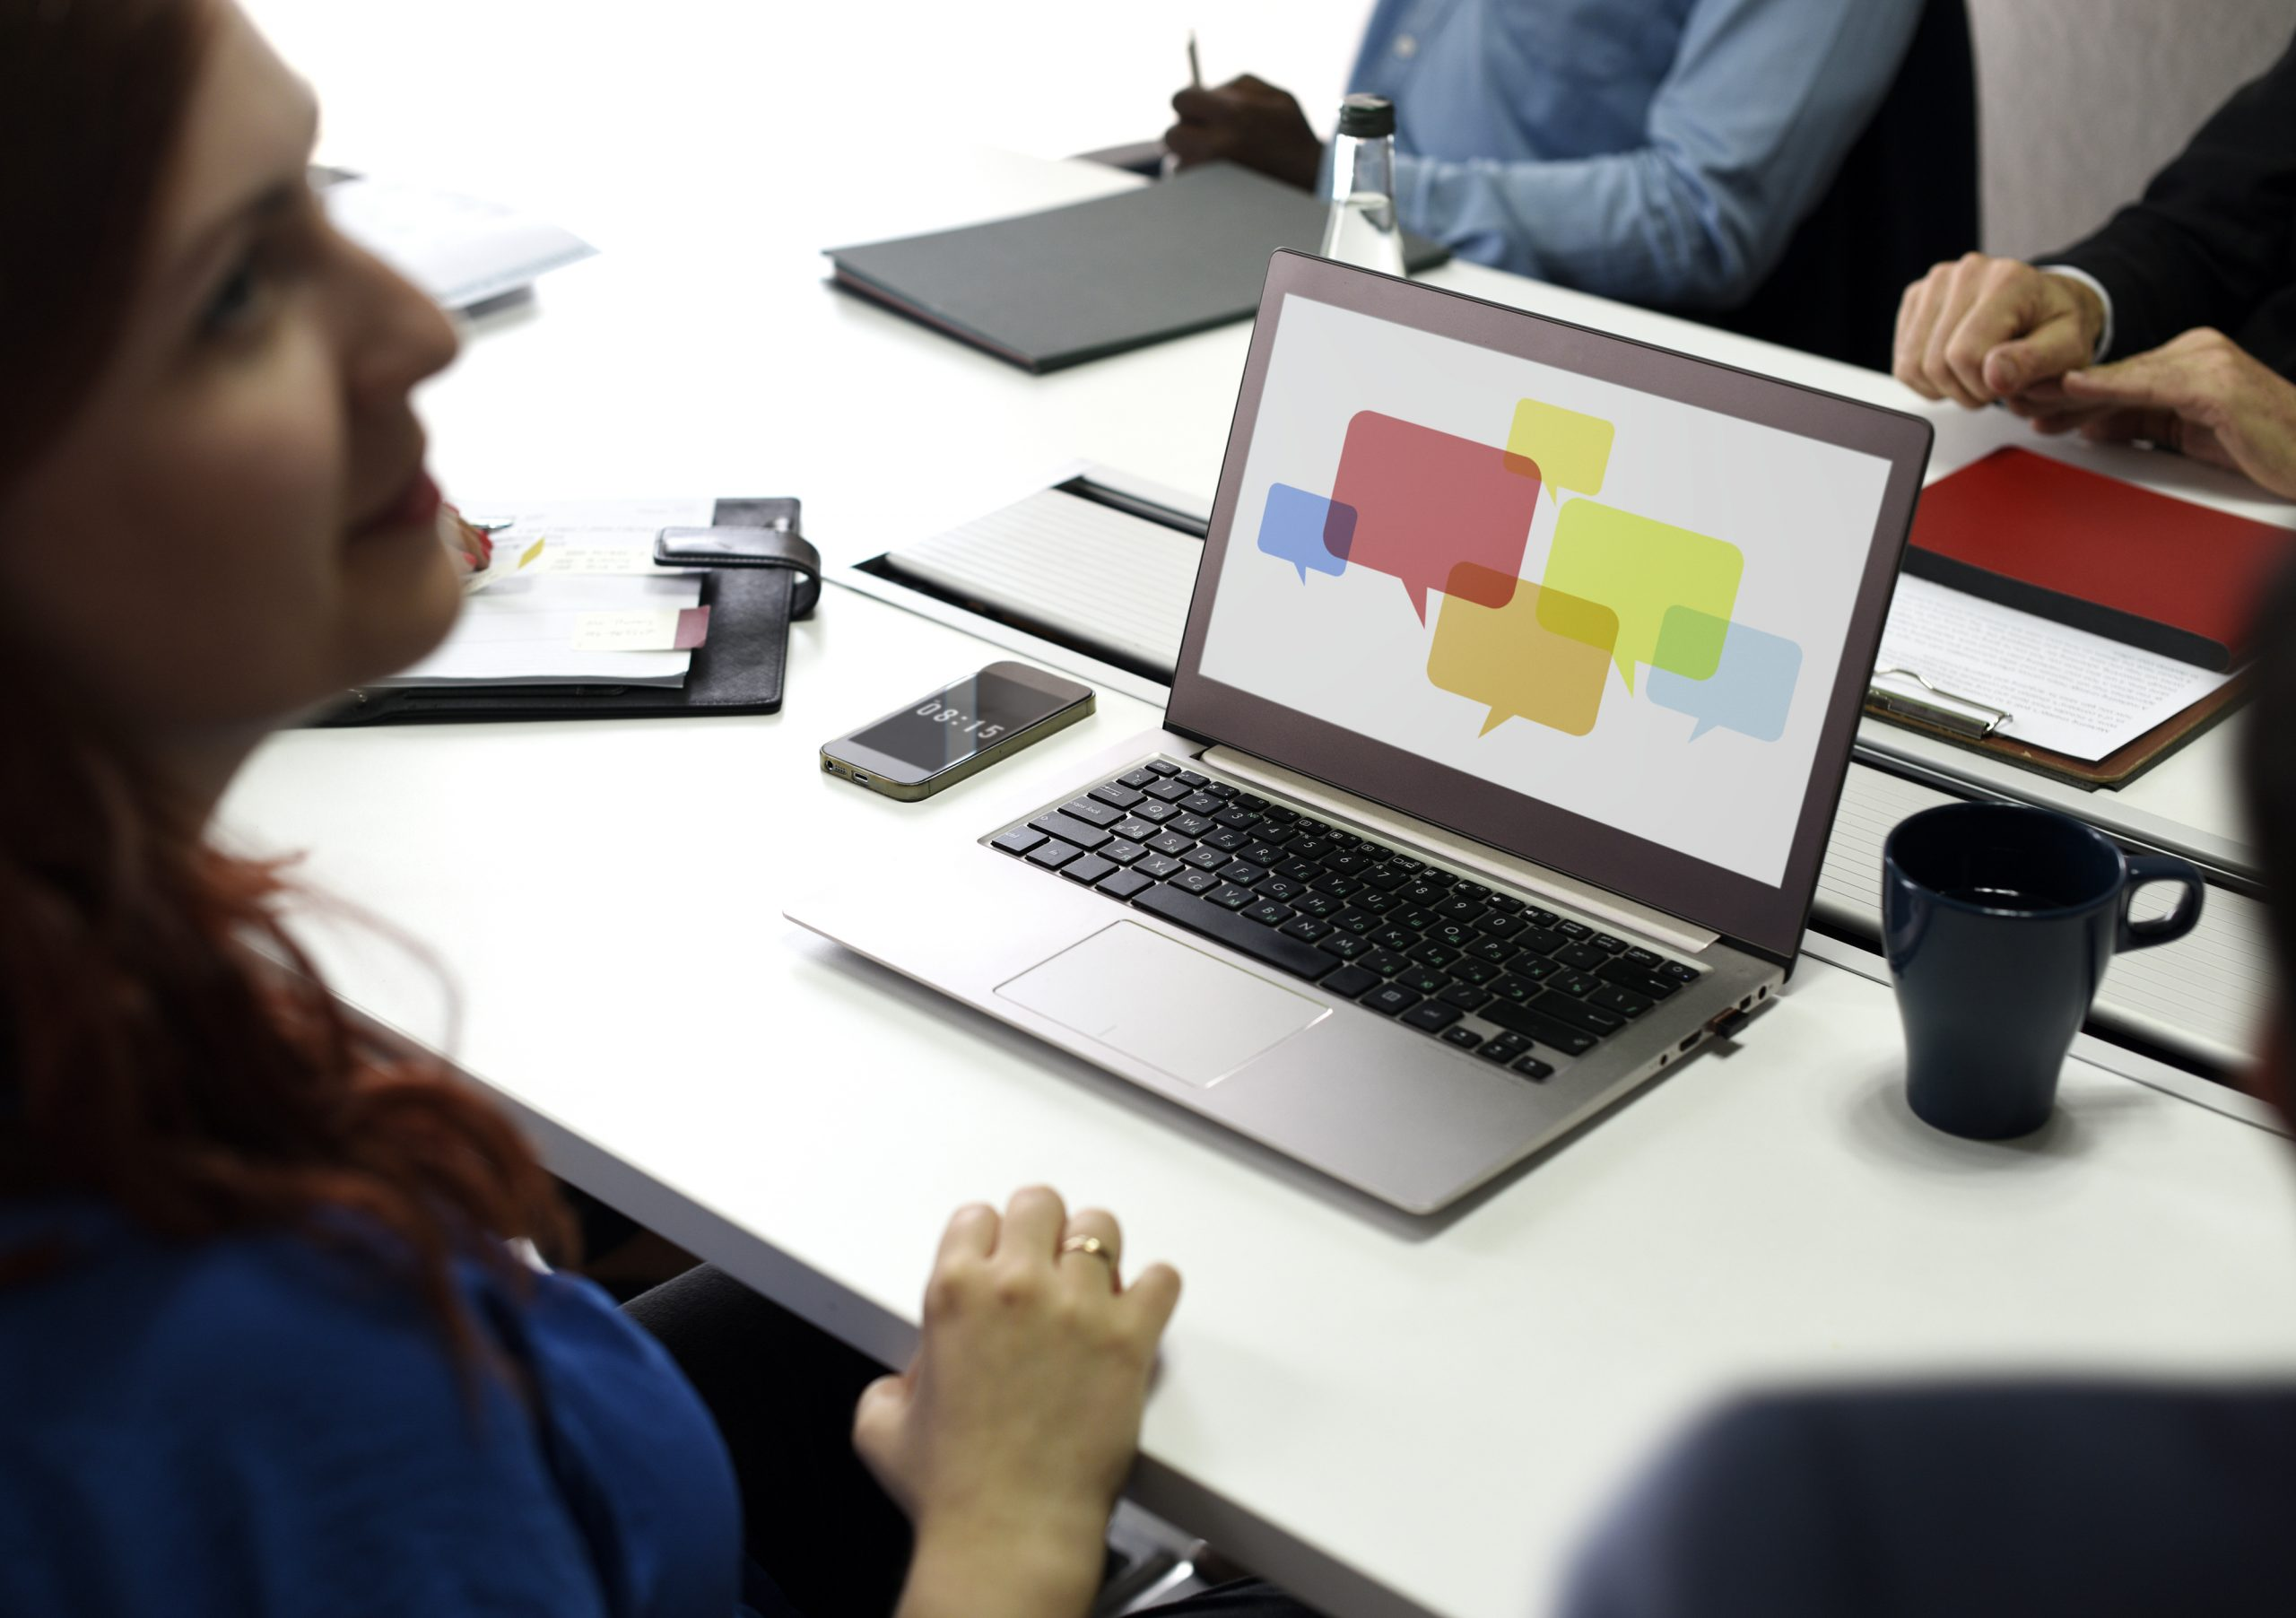 office equipment - computer software